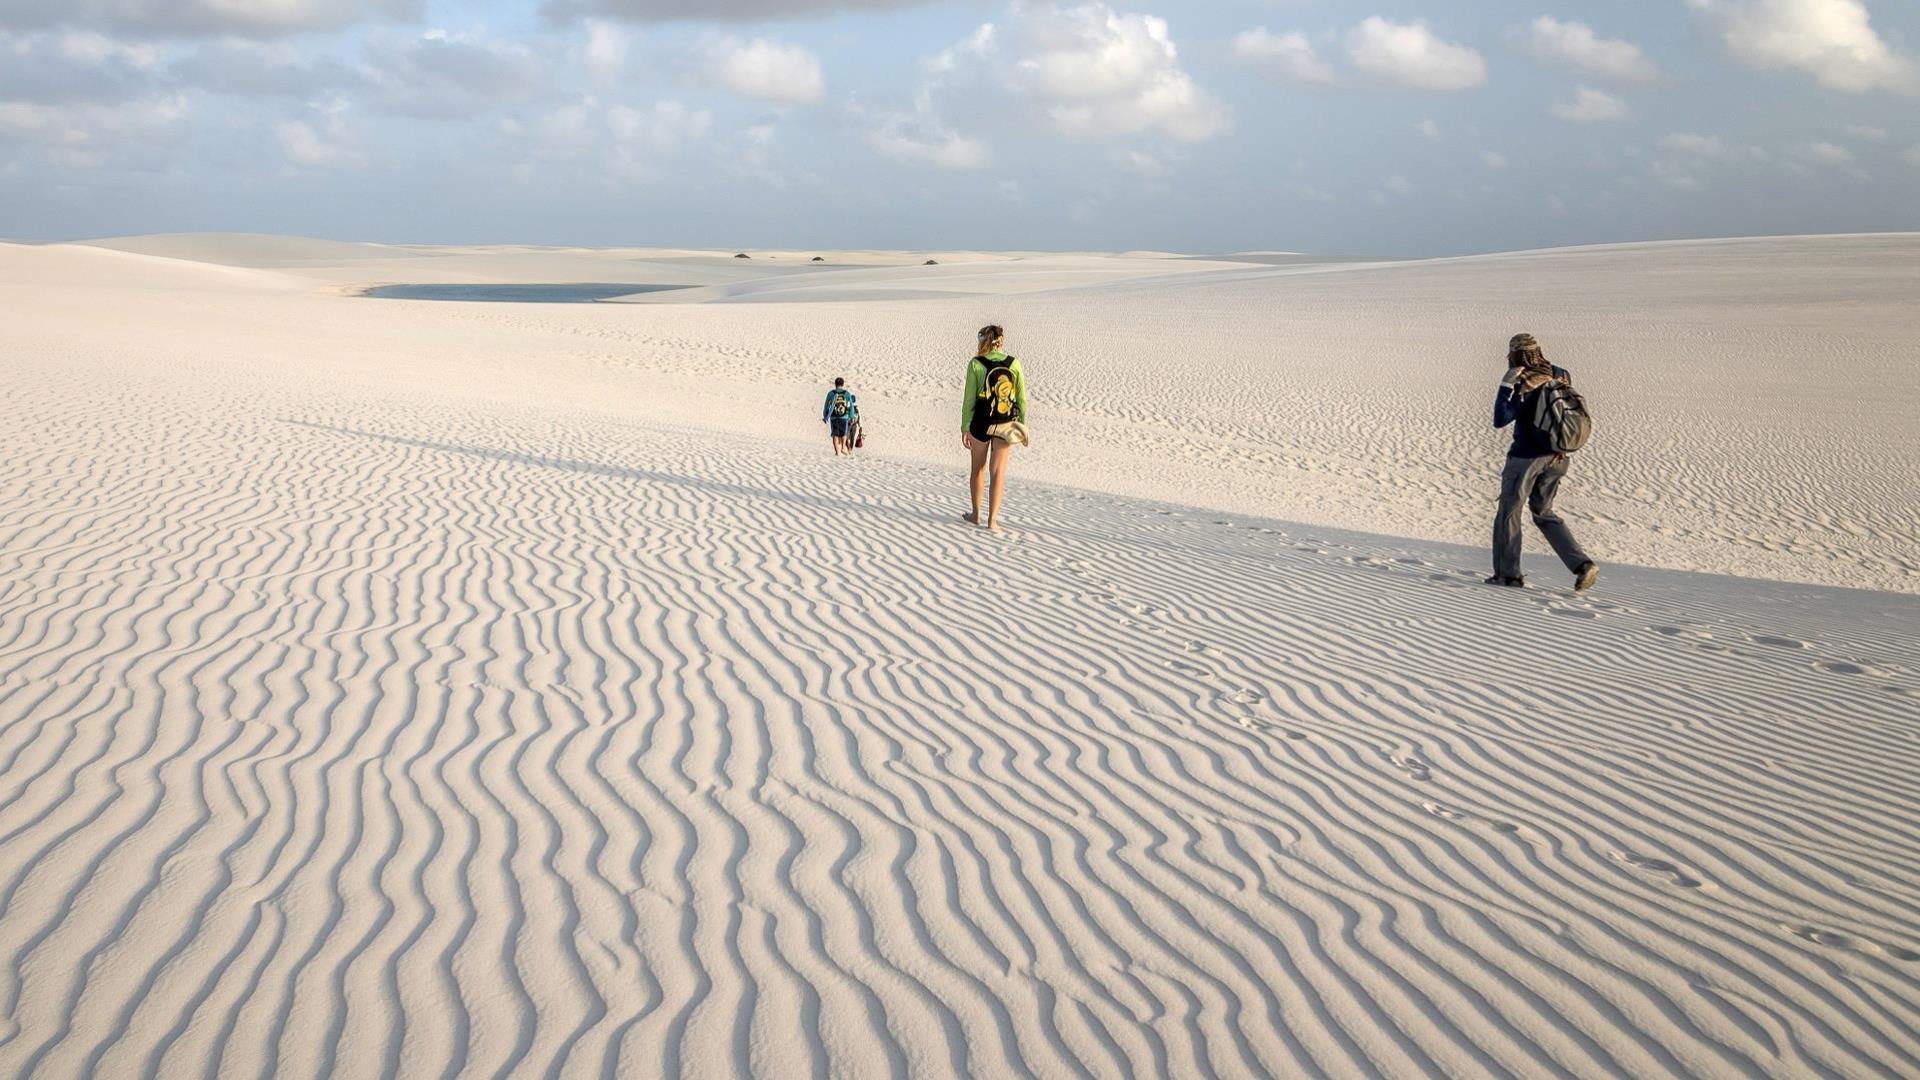 Brazil: Experience Sao Luis and Lencois Maranhenses close-up: endless sand dunes